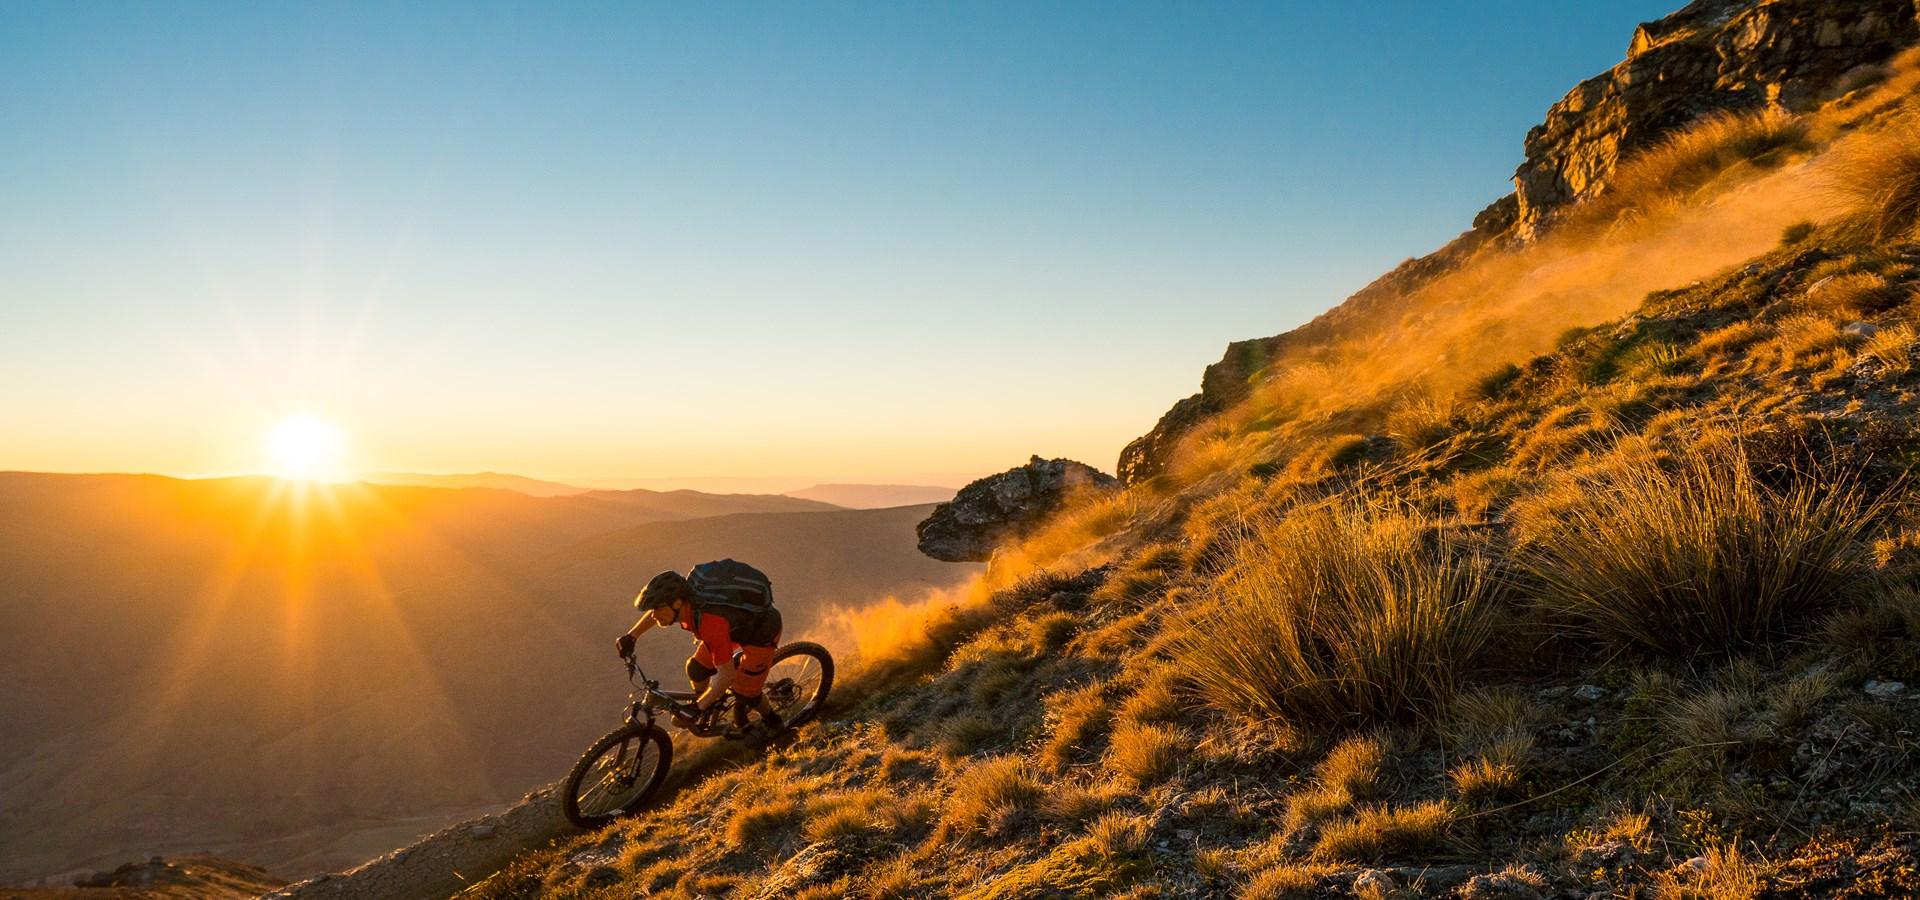 mountain biking in nz s highest bike park cardrona nz